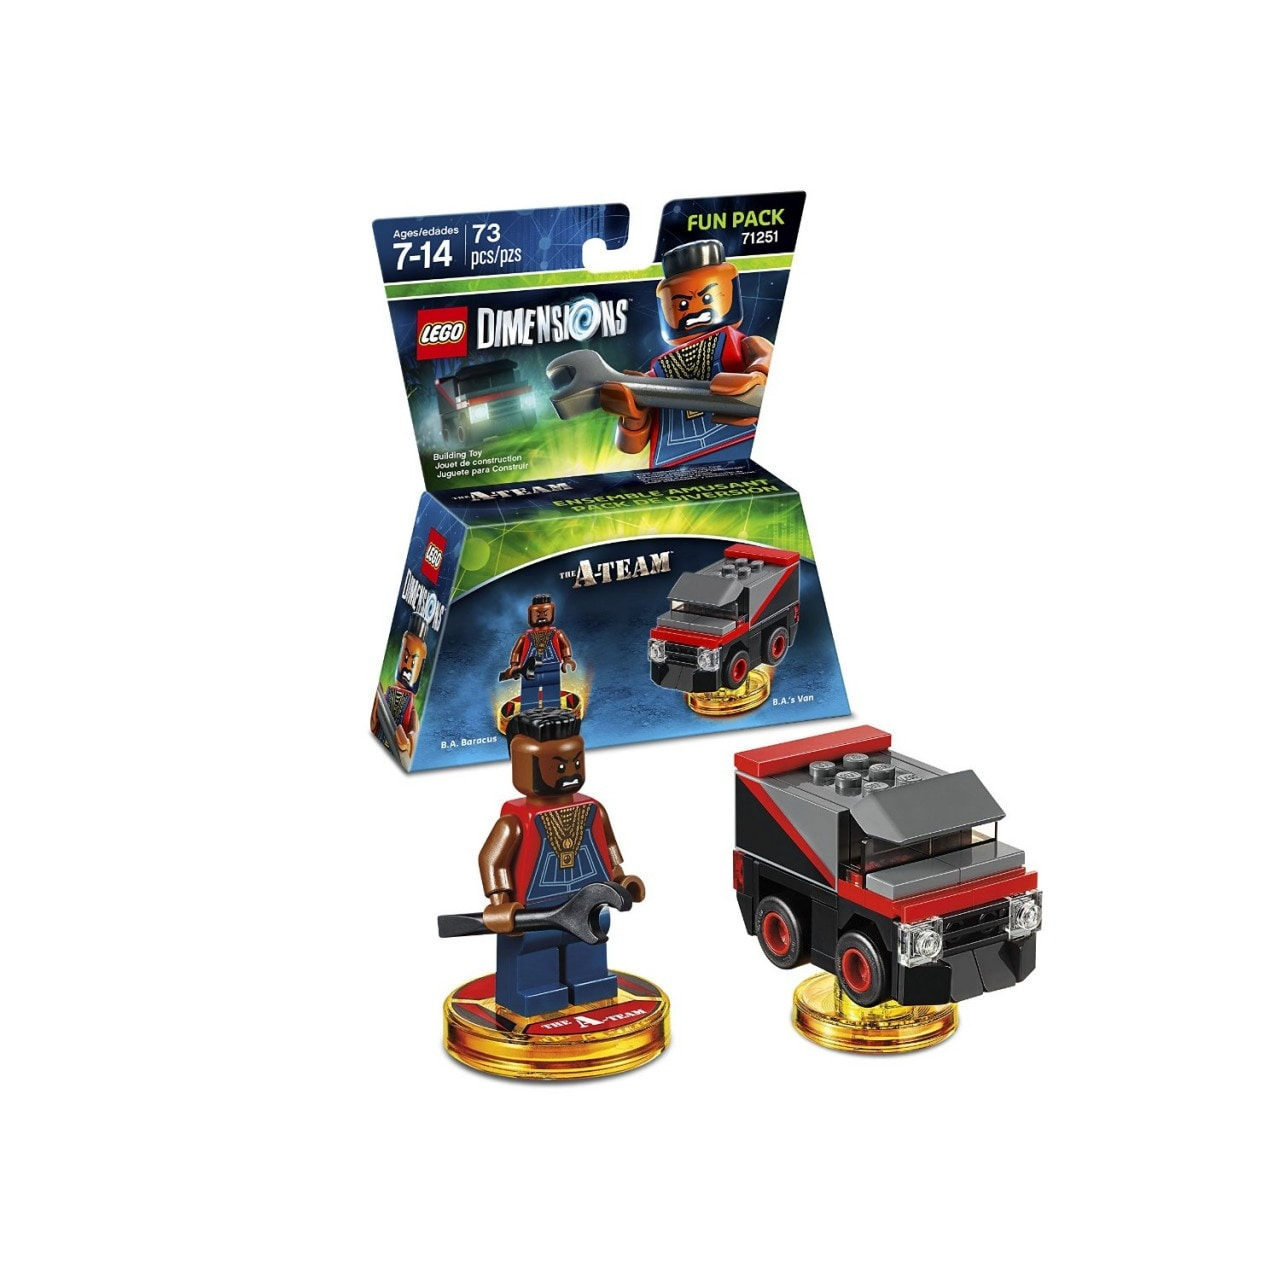 LEGO Dimensions nuovi set - 2